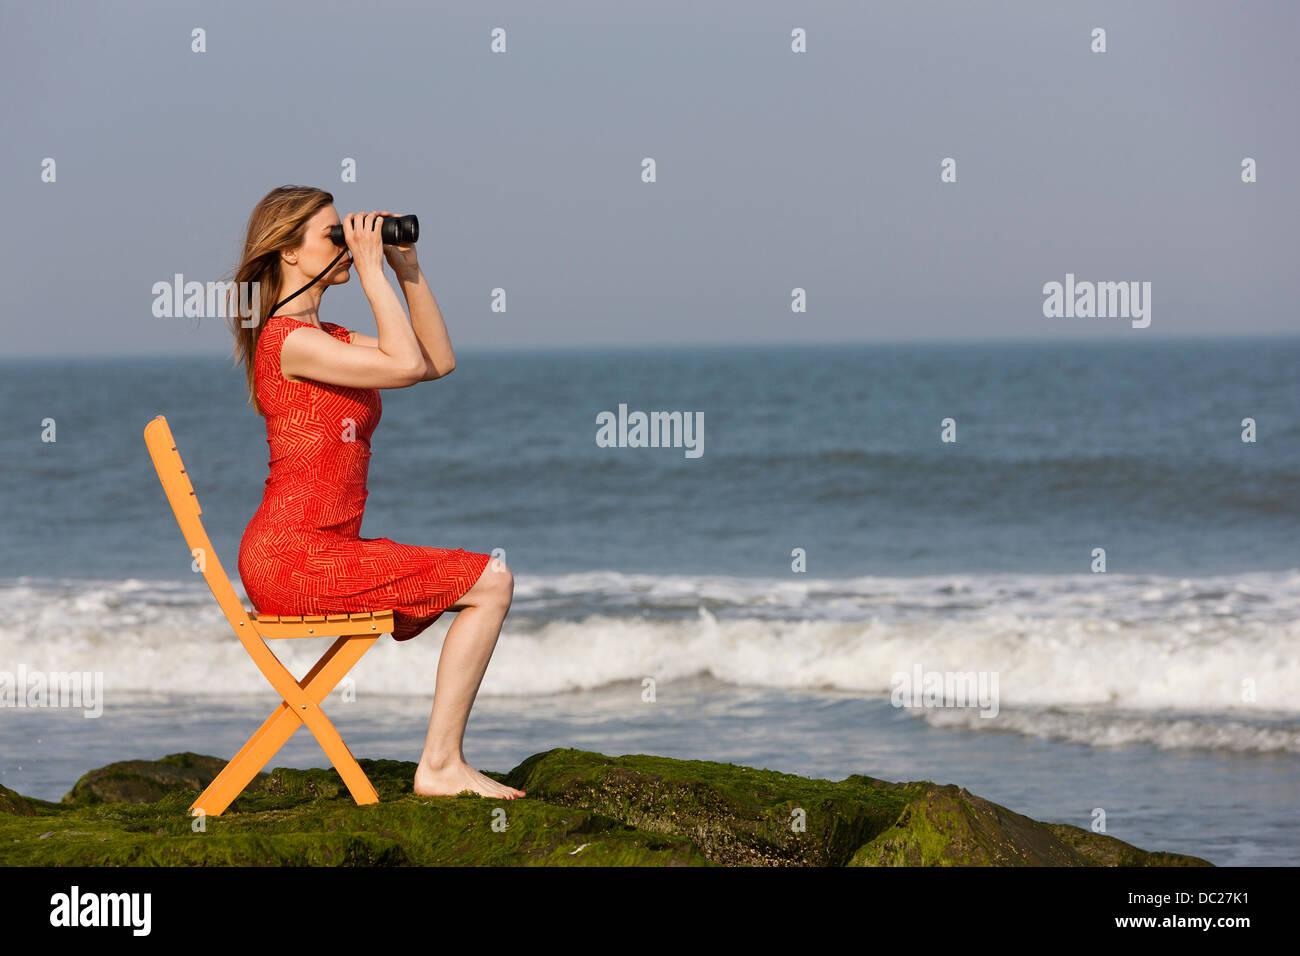 Mature woman sitting on chair on beach with binoculars - Stock Image